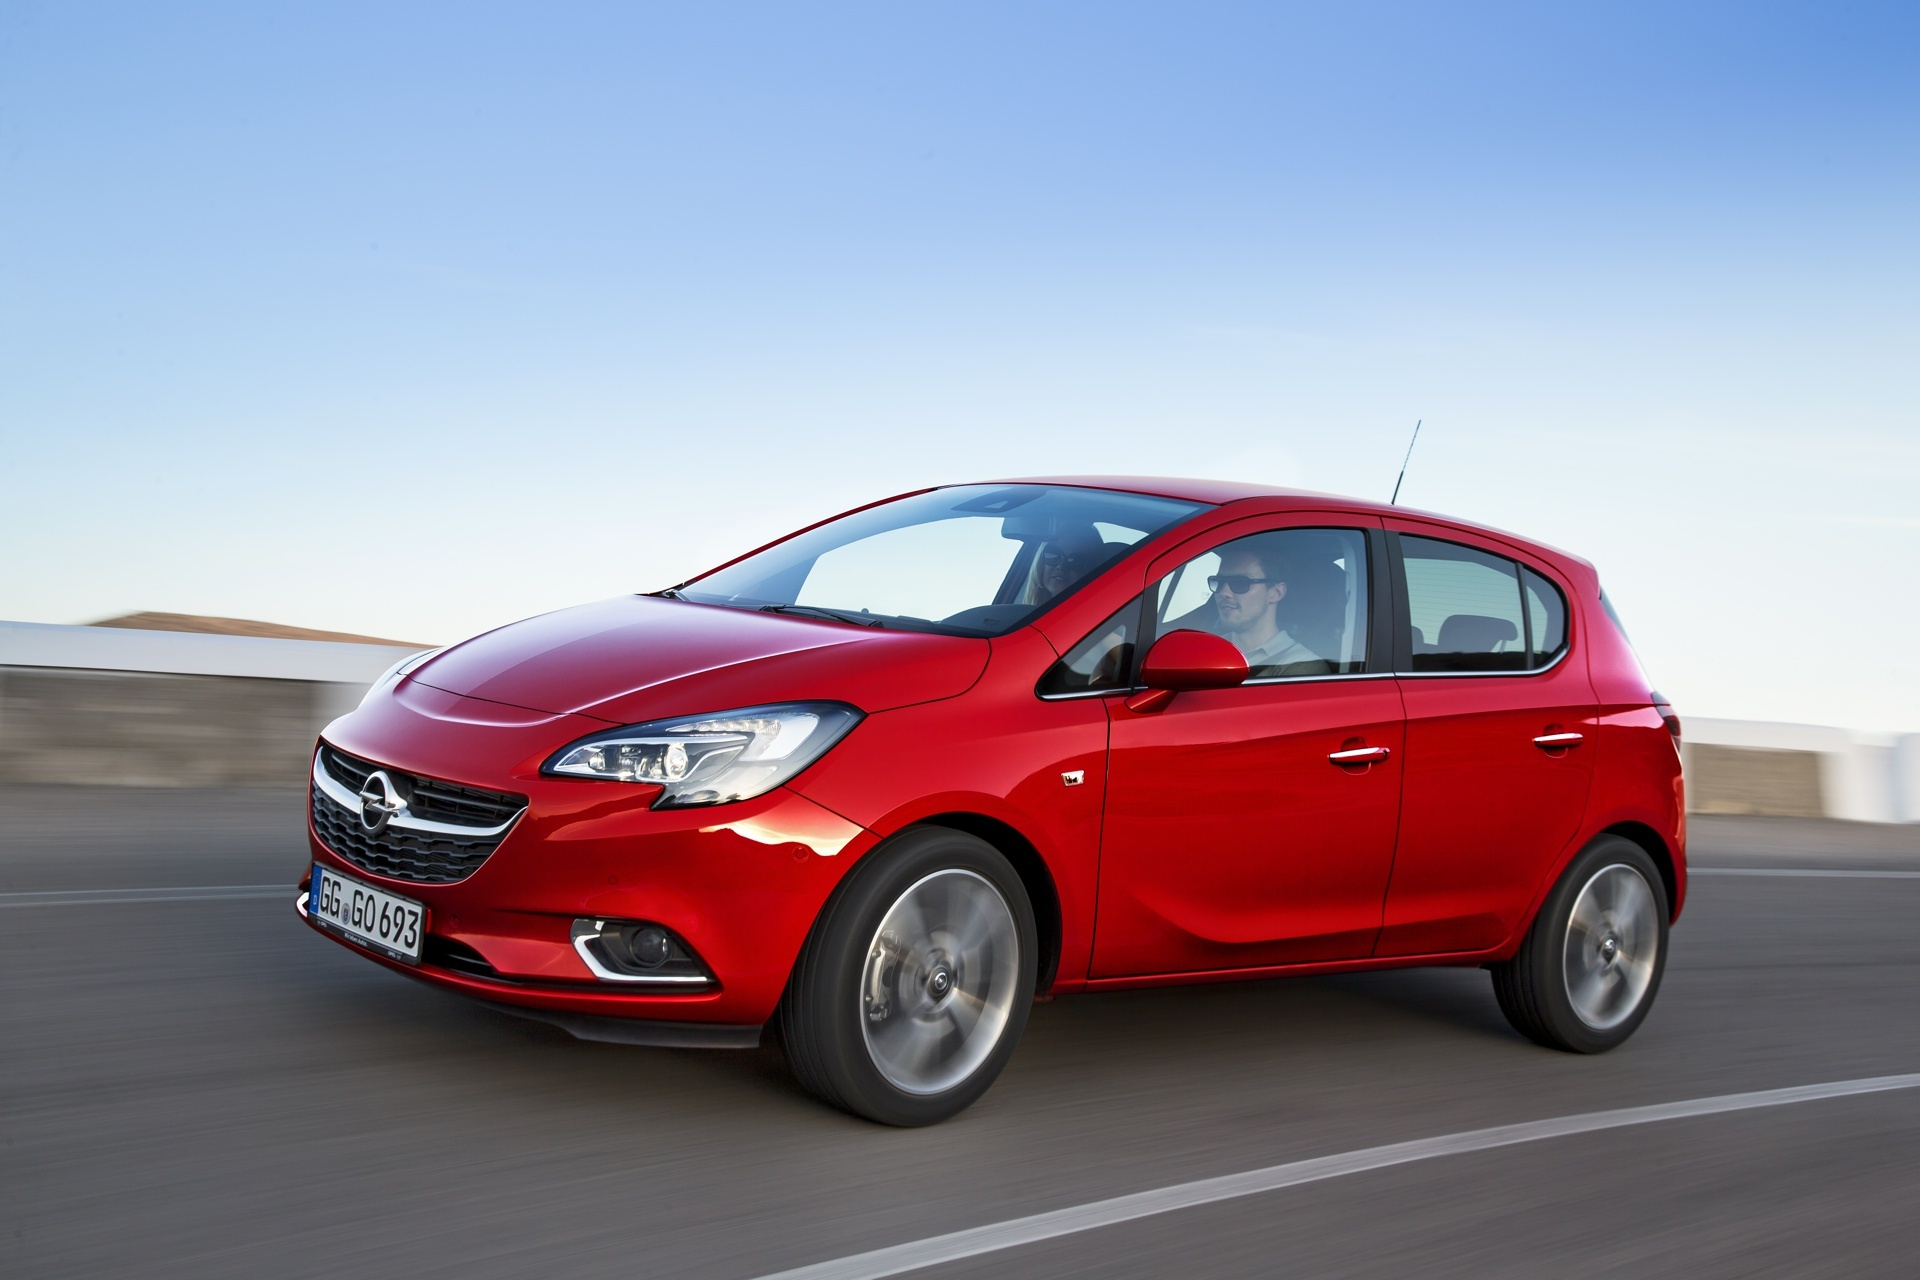 Foto de Opel Corsa 2014 (11/20)